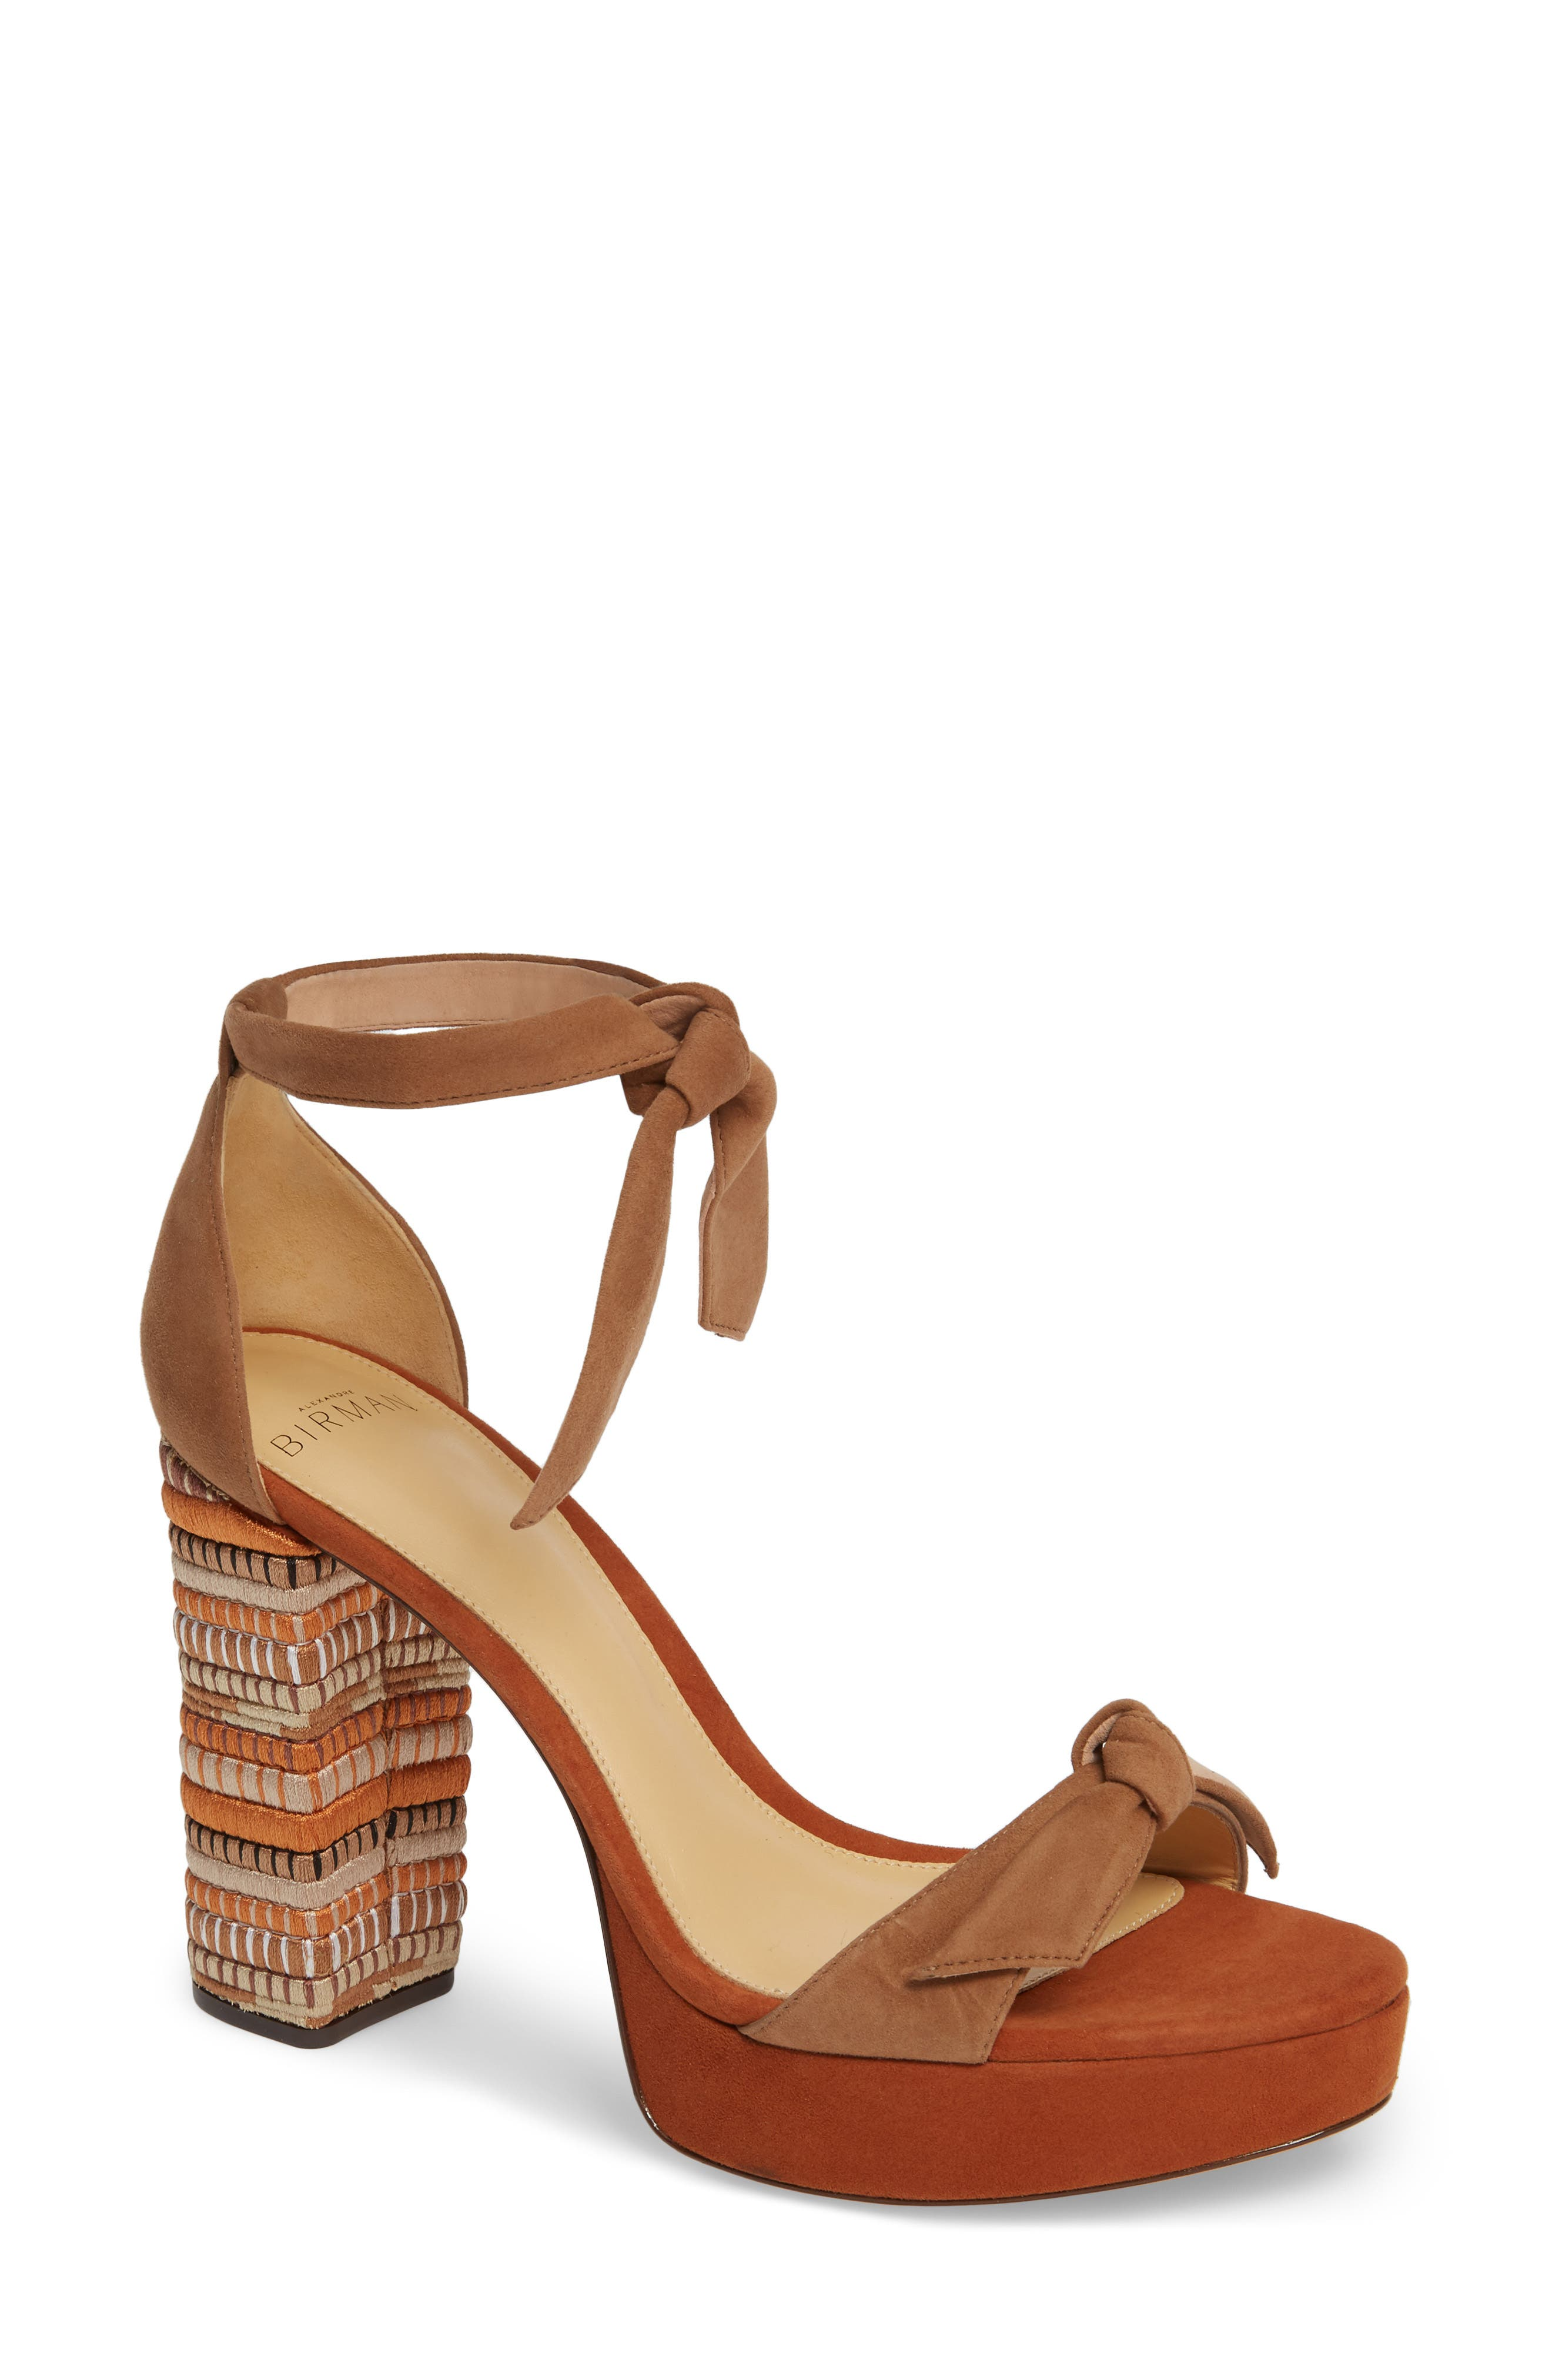 ALEXANDRE BIRMAN Mabeleh Platform Sandal, Main, color, BEIGE/ COCOA